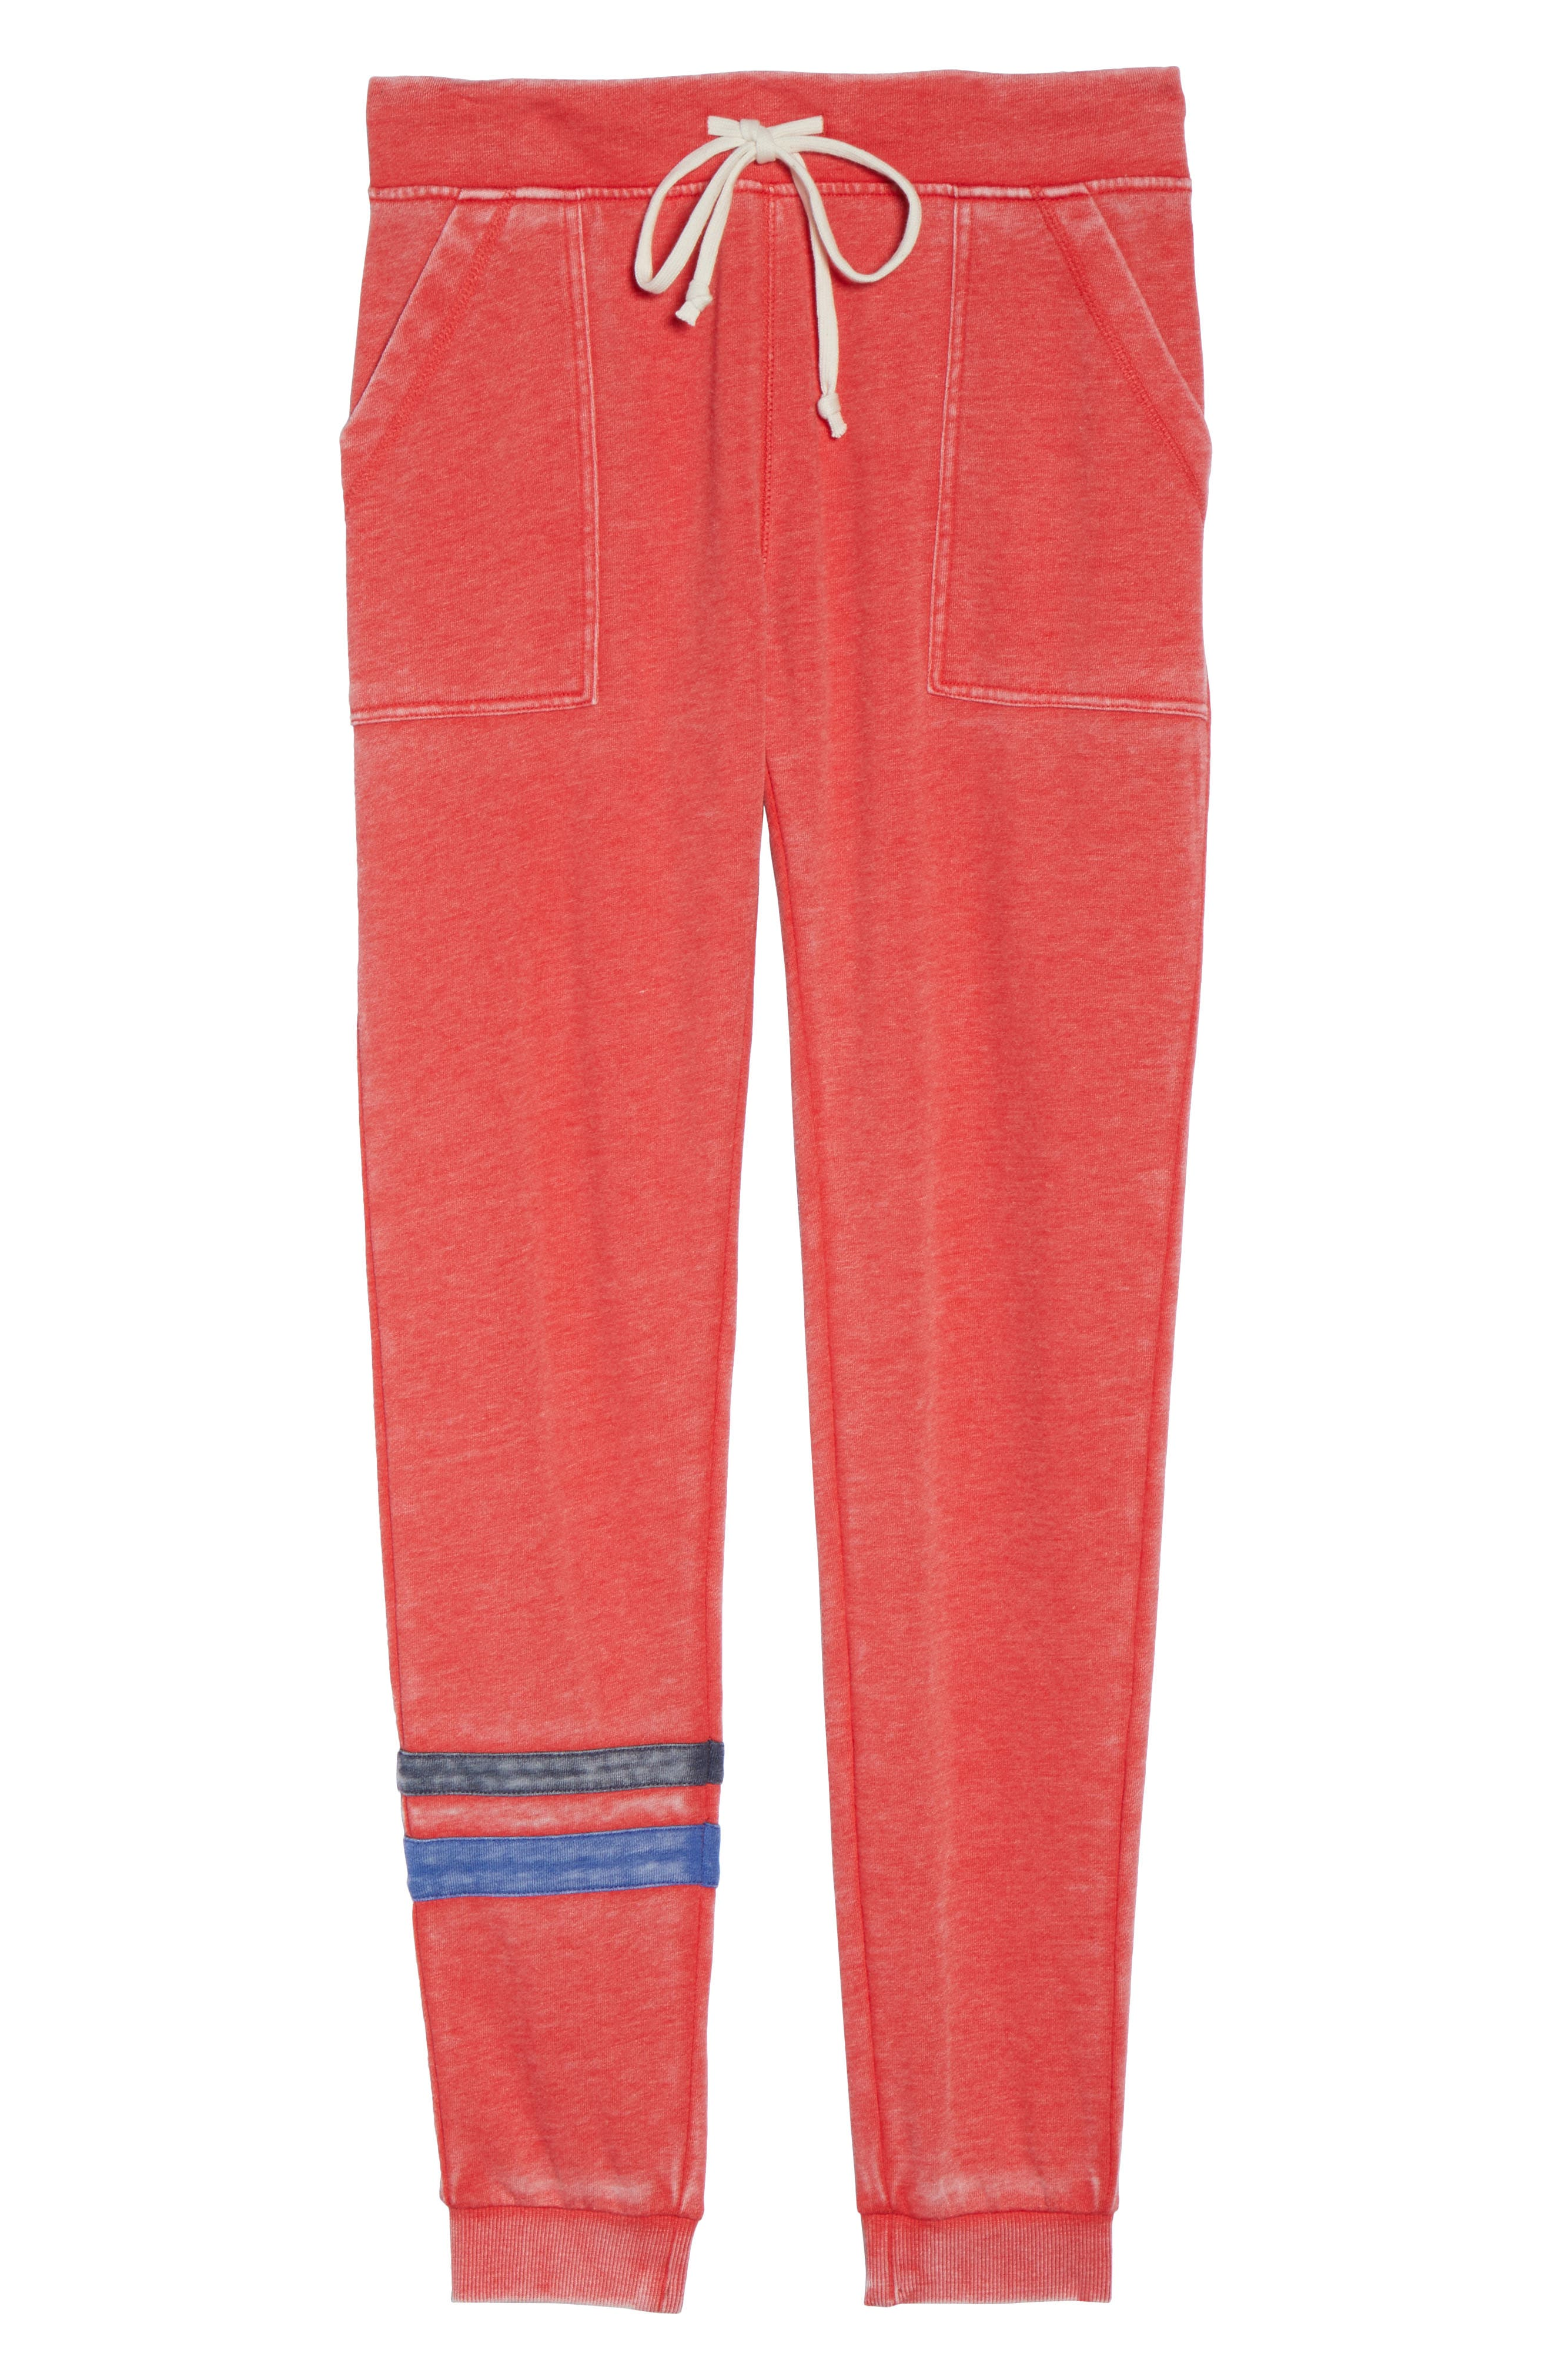 Long Weekend Lounge Jogger Pants,                             Alternate thumbnail 4, color,                             Red Bloom/ Dark Navy/ Blue